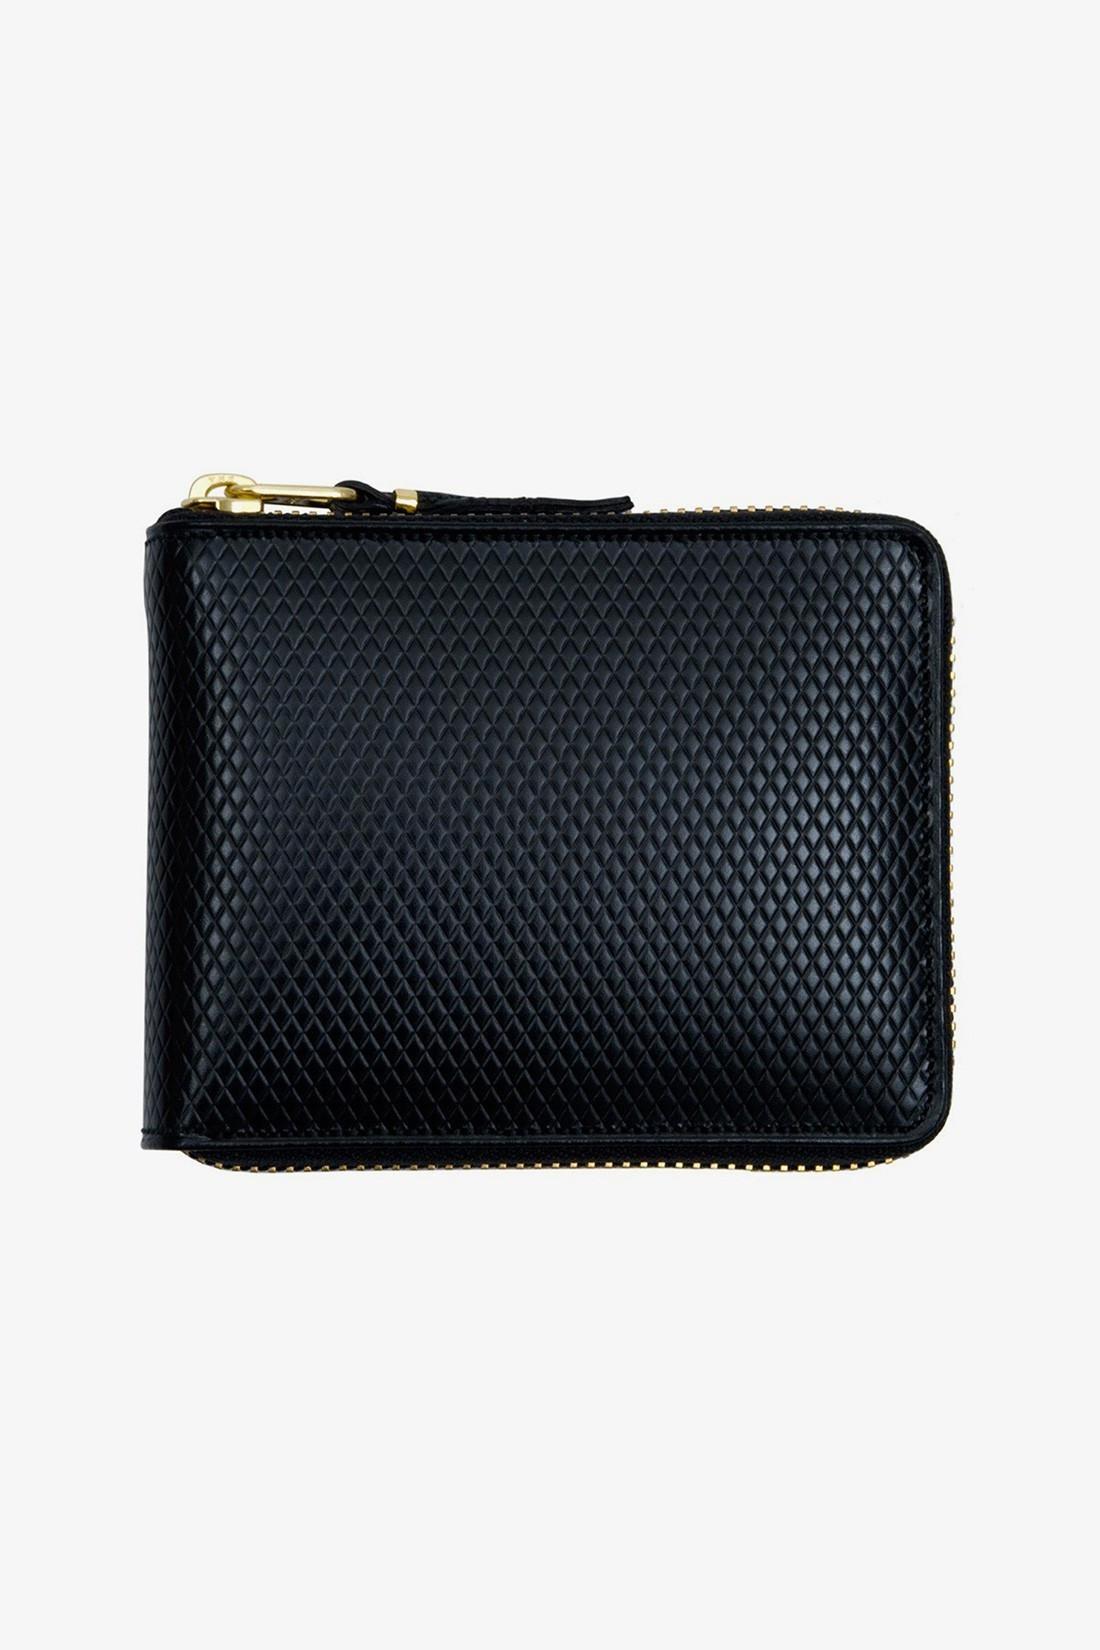 COMME DES GARÇONS WALLETS / Cdg luxury group sa7100lg Black